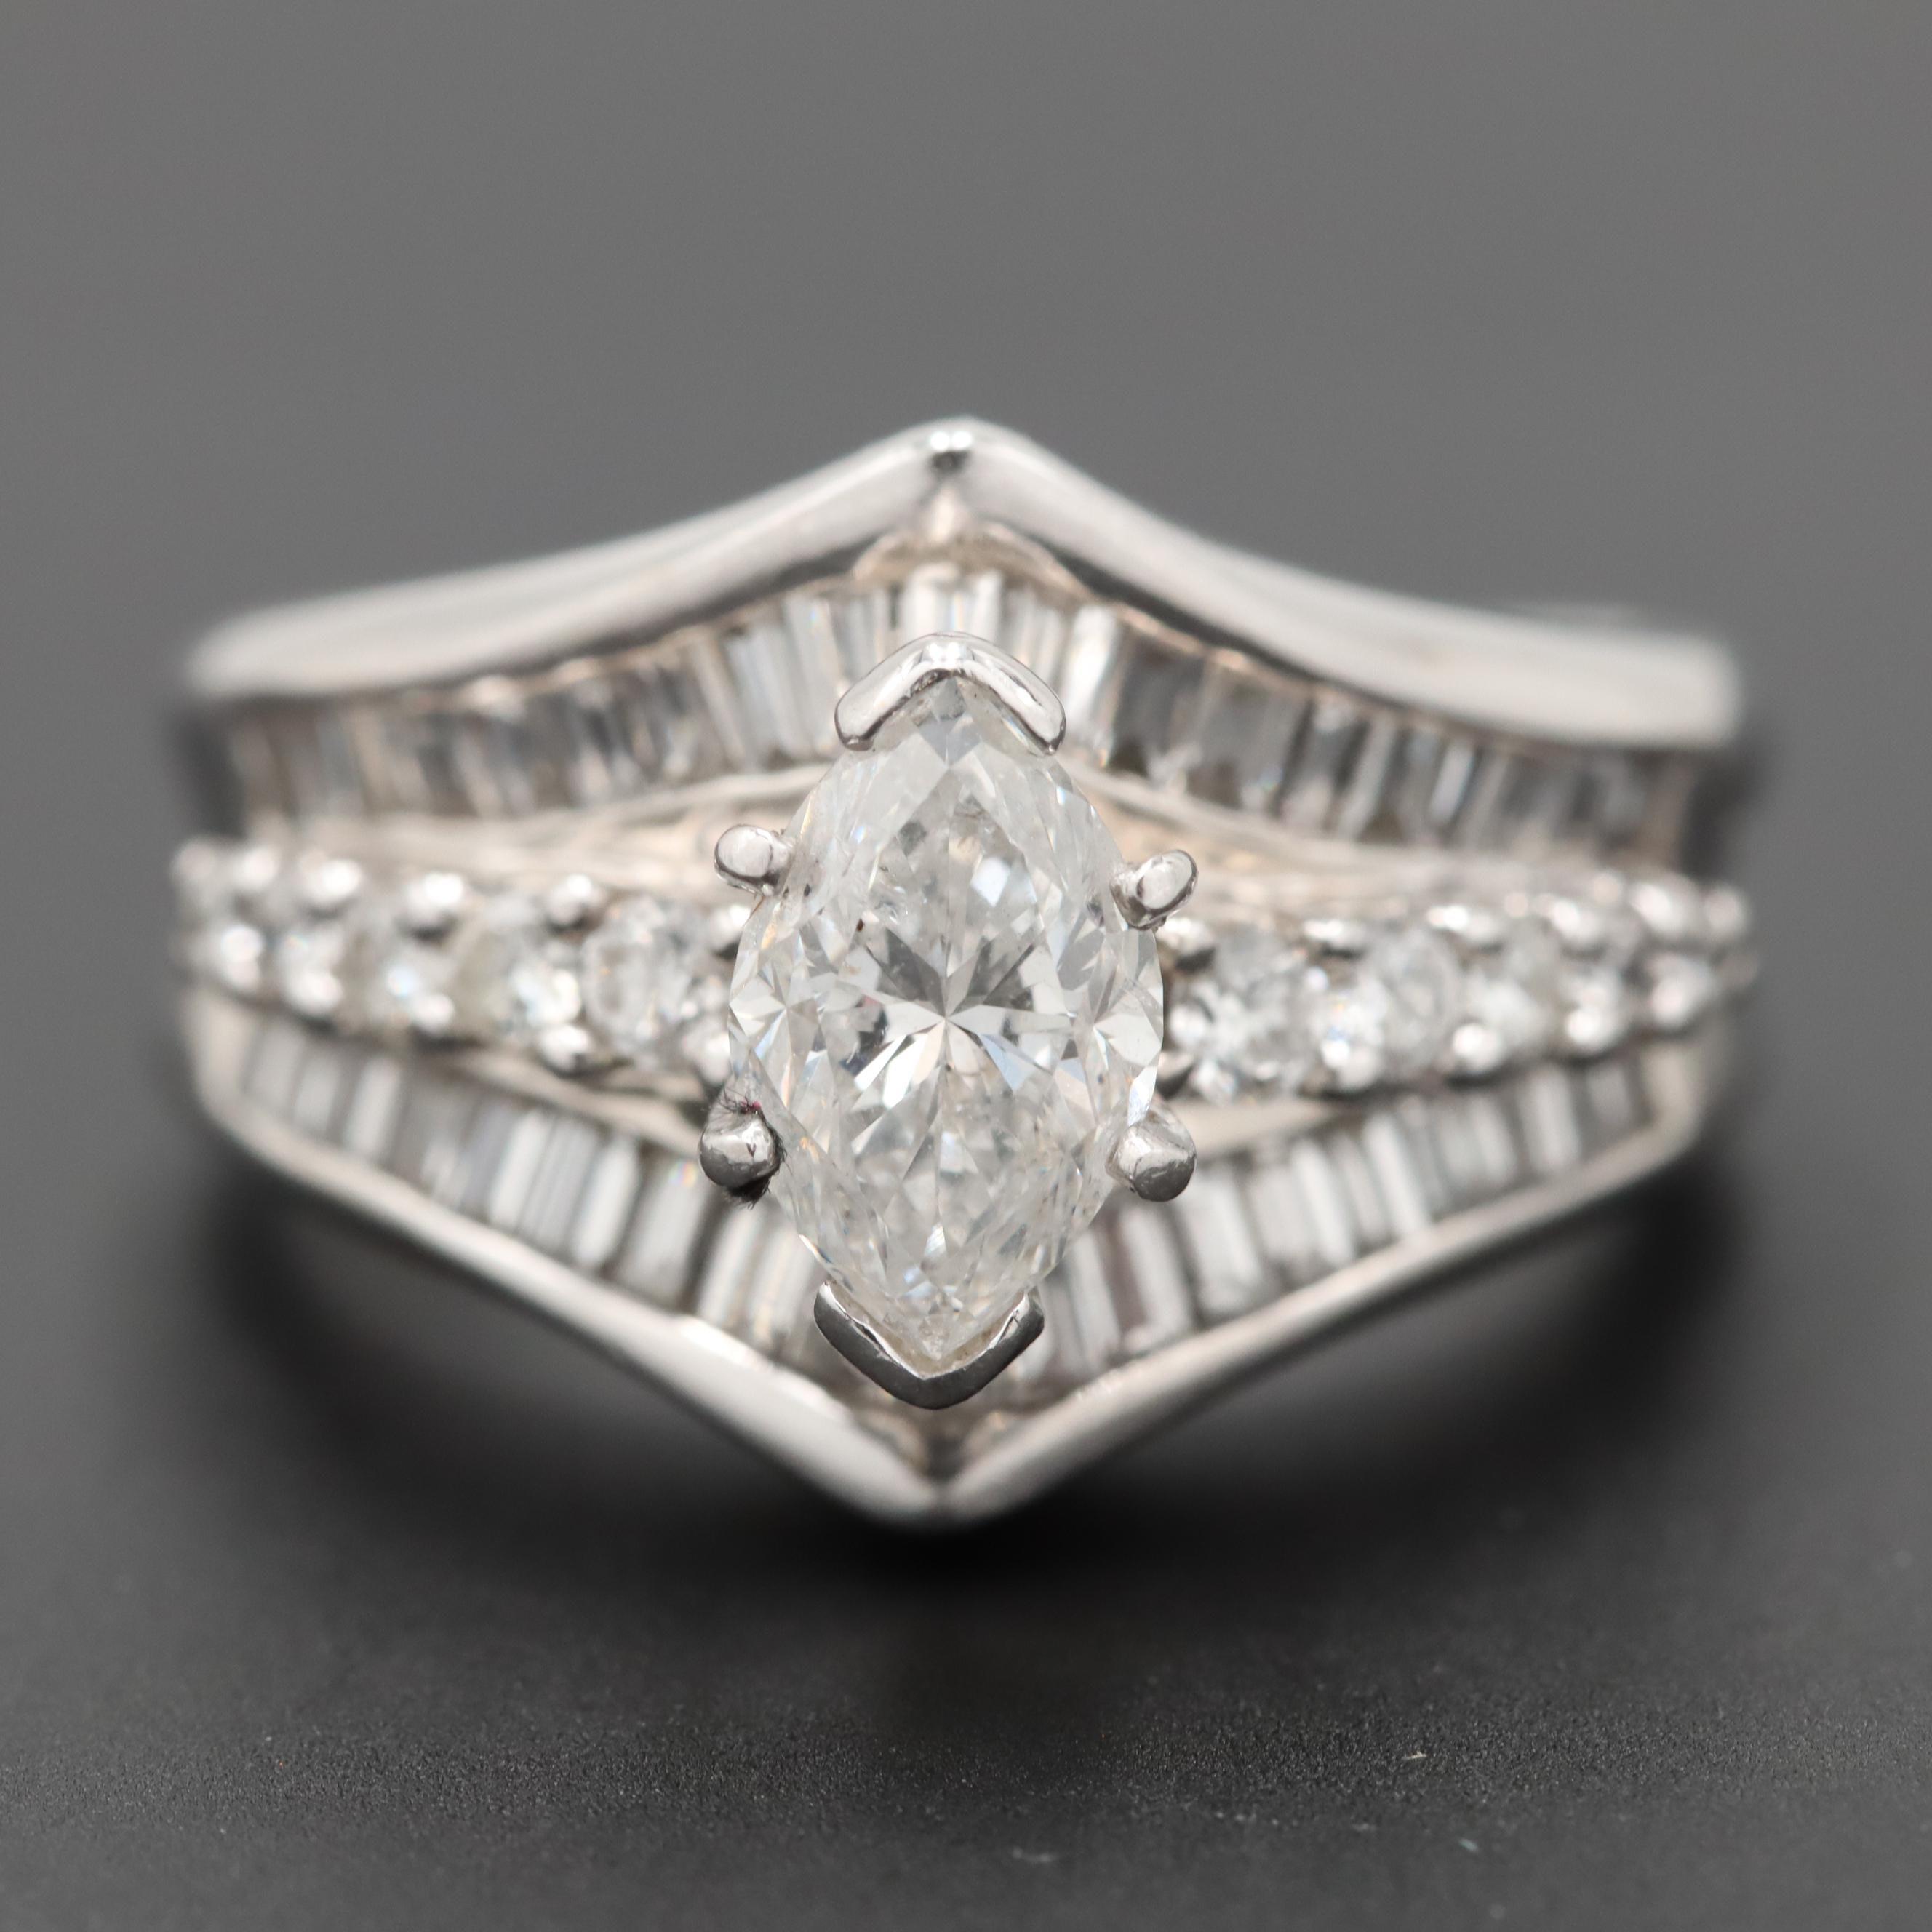 14K White Gold 1.99 CTW Diamond Ring